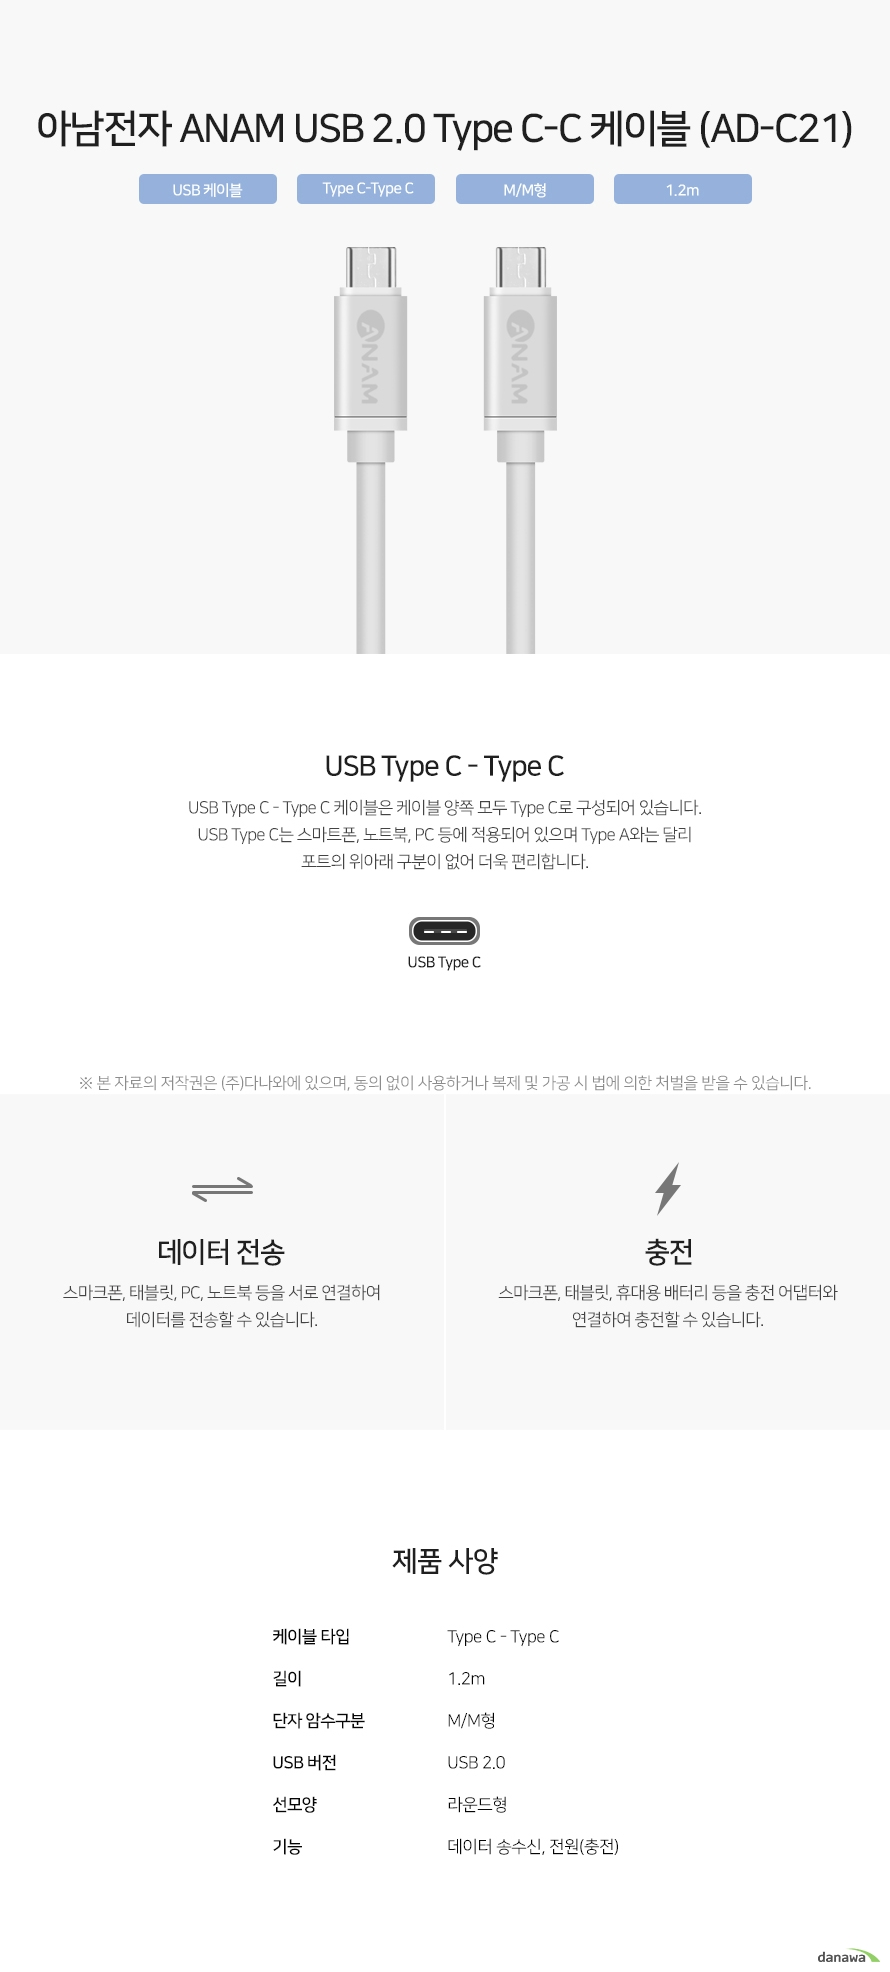 USB Type C - Type C 케이블은 케이블 양쪽 모두 Type C로 구성되어 있습니다.  USB Type C는 스마트폰, 노트북, PC 등에 적용되어 있으며 Type A와는 달리 포트의 위아래 구분이 없어 더욱 편리합니다.  스마크폰, 태블릿, PC, 노트북 등을 서로 연결하여 데이터를 전송할 수 있습니다.   스마크폰, 태블릿, 휴대용 배터리 등을 충전 어댑터와 연결하여 충전할 수 있습니다.